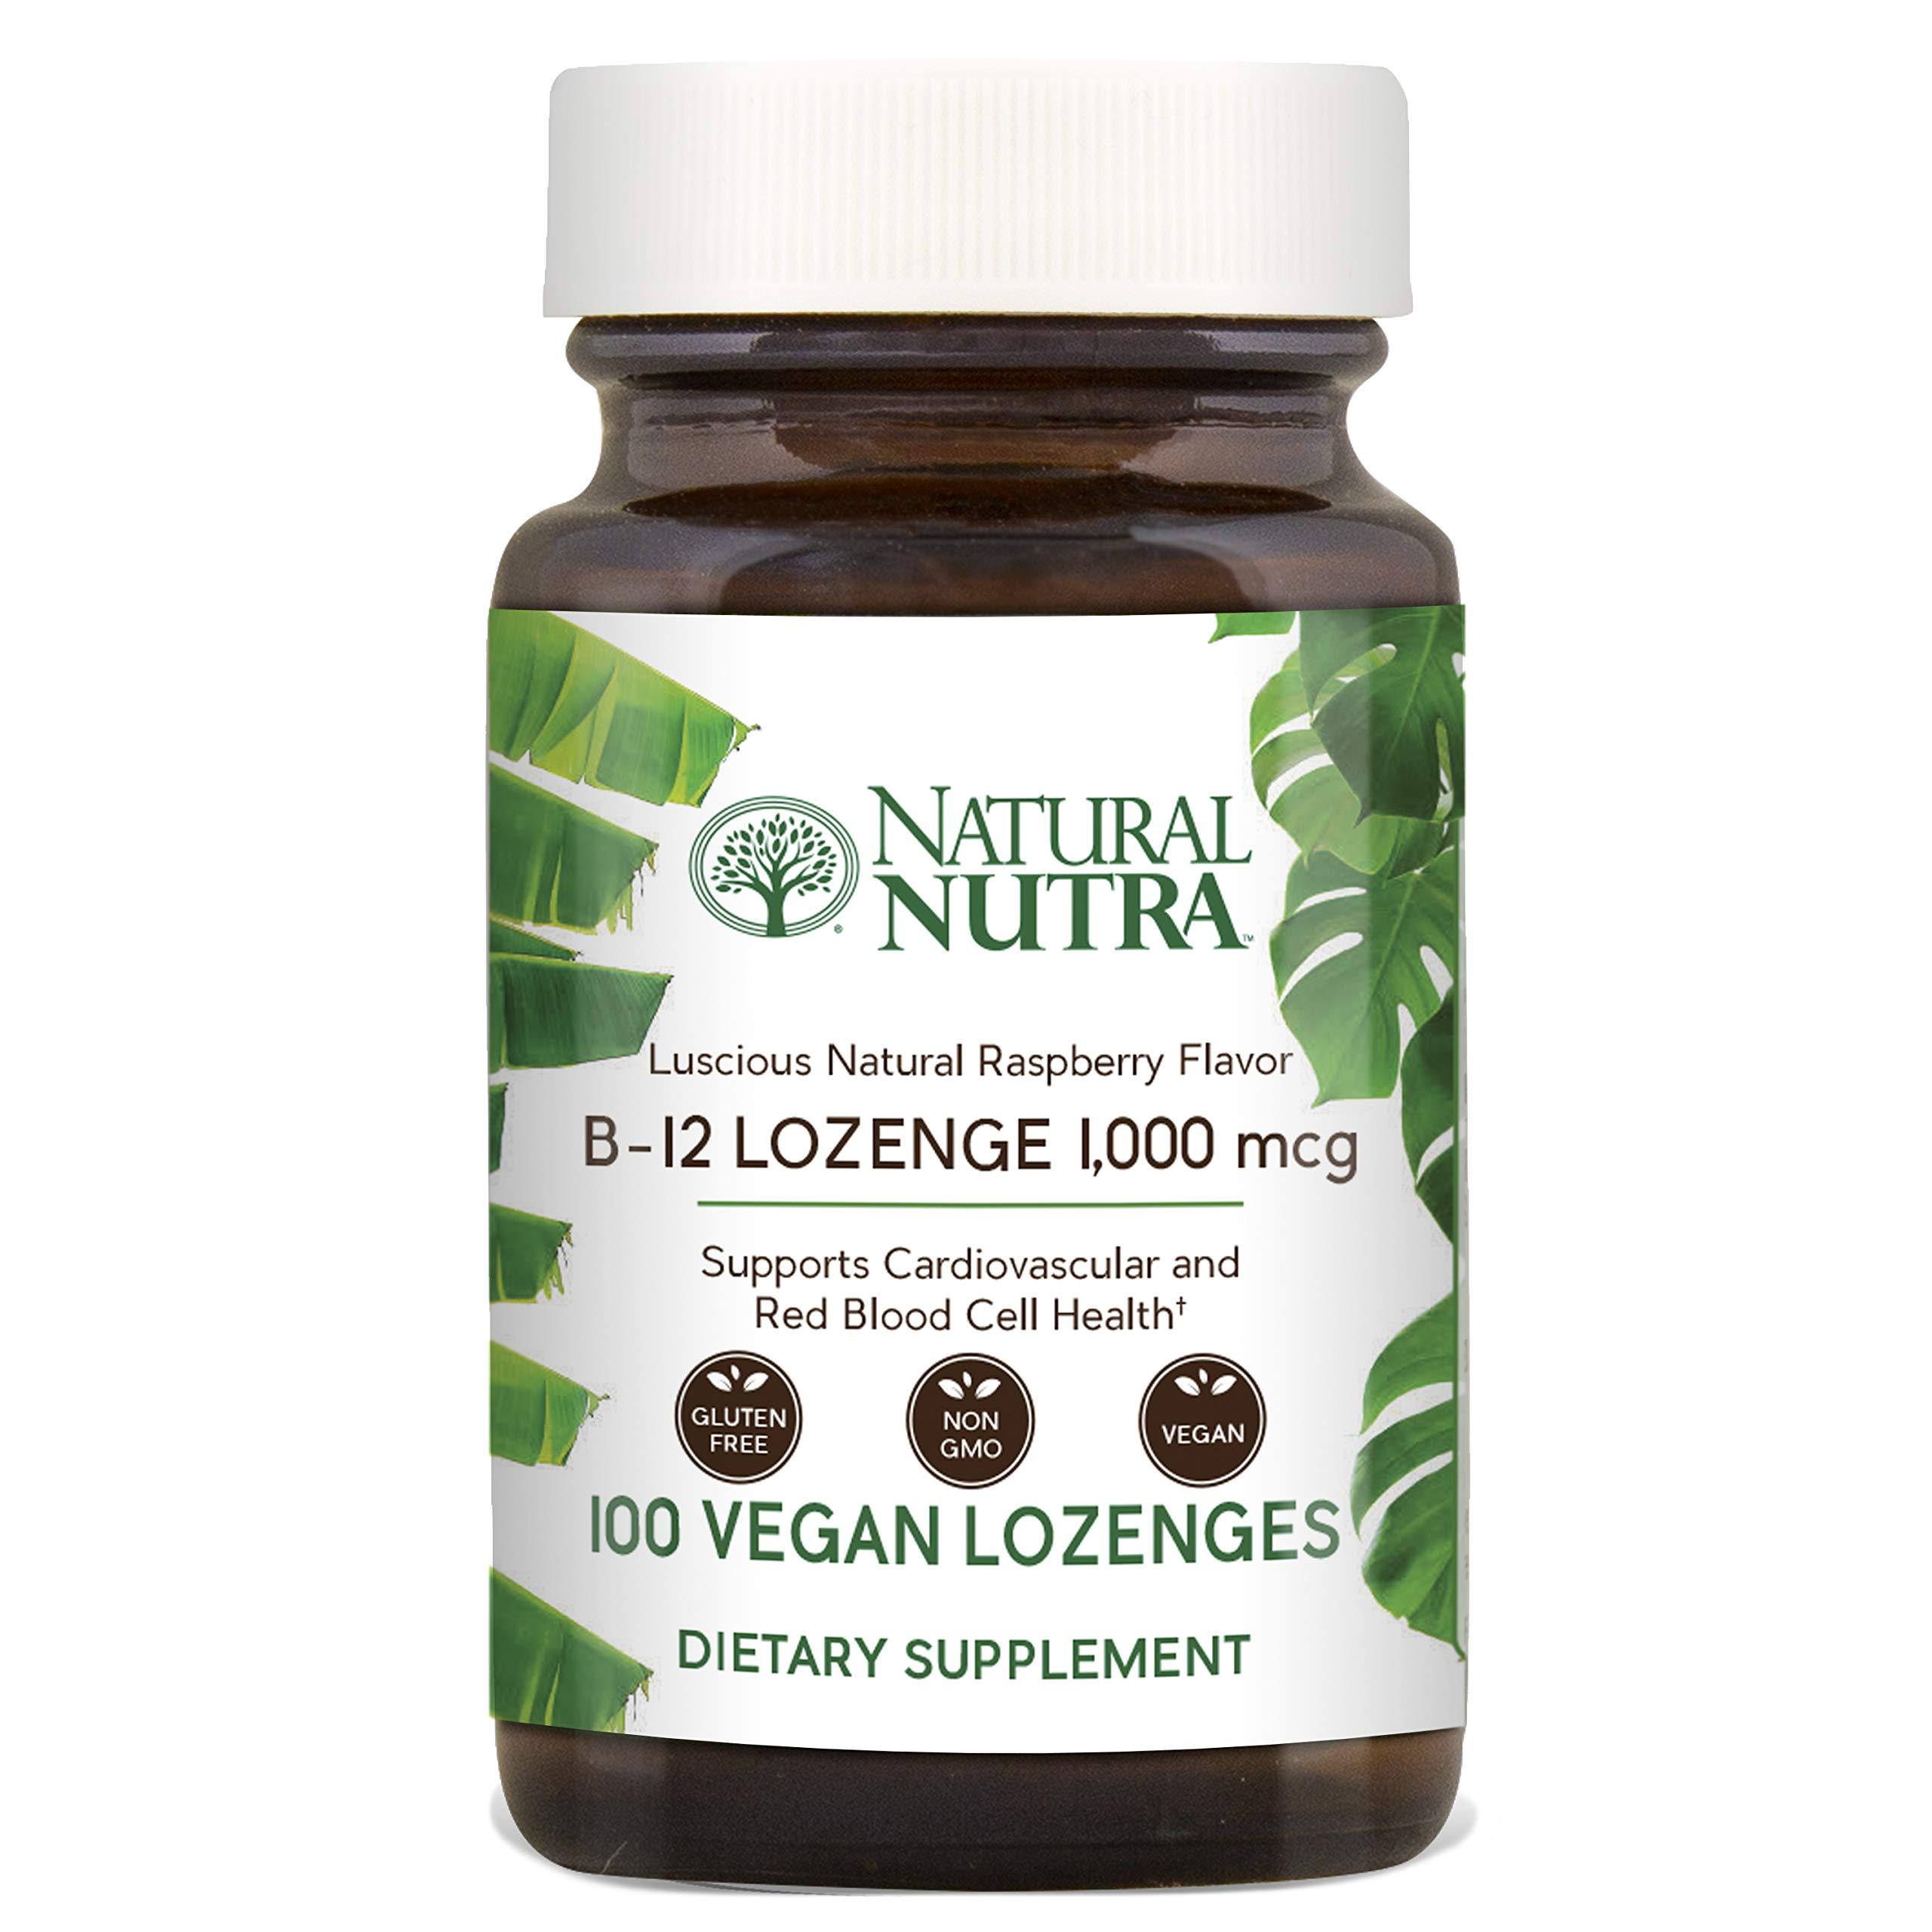 Natural Nutra Vitamin B12 (Cyanocobalamin) Supplement, 1000 mcg, Non-GMO, Vegan and Vegetarian, Pure and Potent, Raspberry Flavor, 100 Lozenges